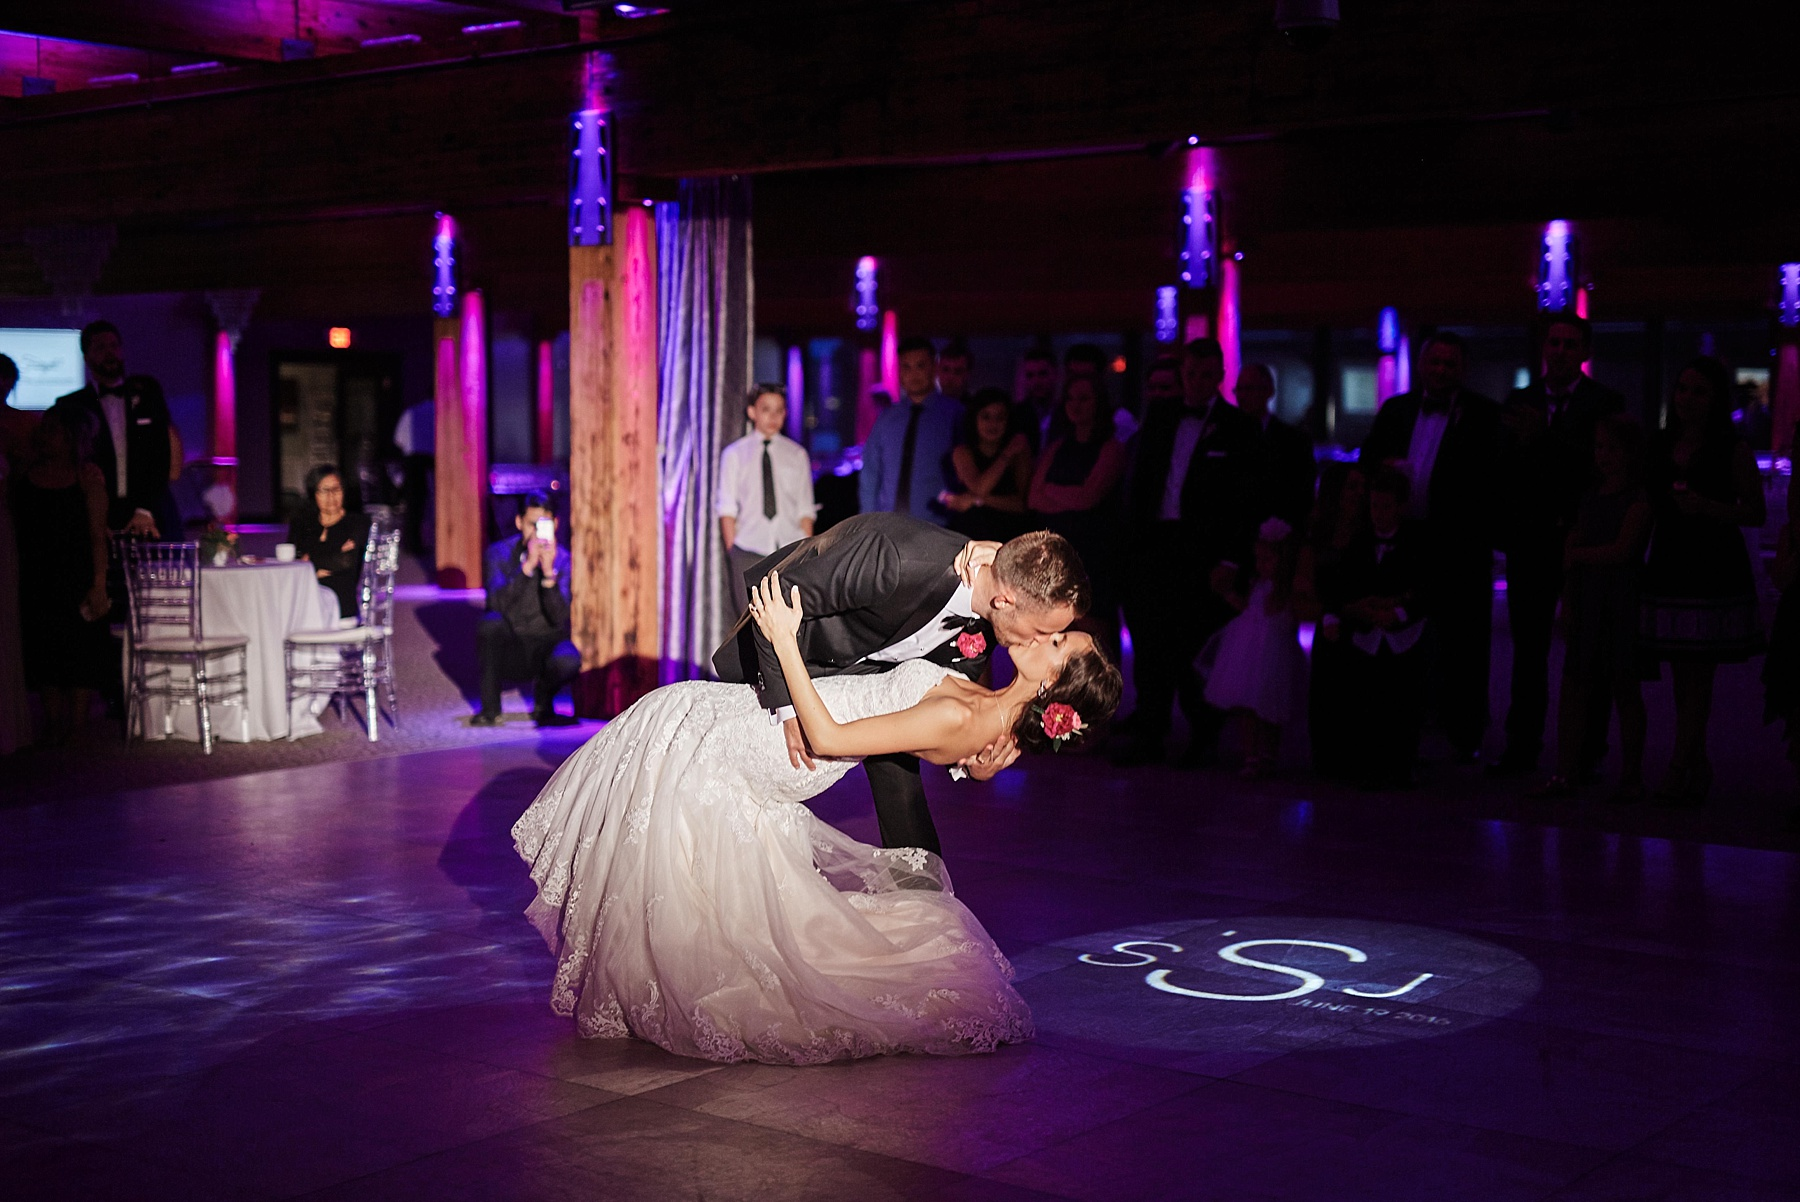 ABULAE-Wedding-Saint-paul-MN-Josh-Sofia-Wedding-Mears-Park_0845.jpg